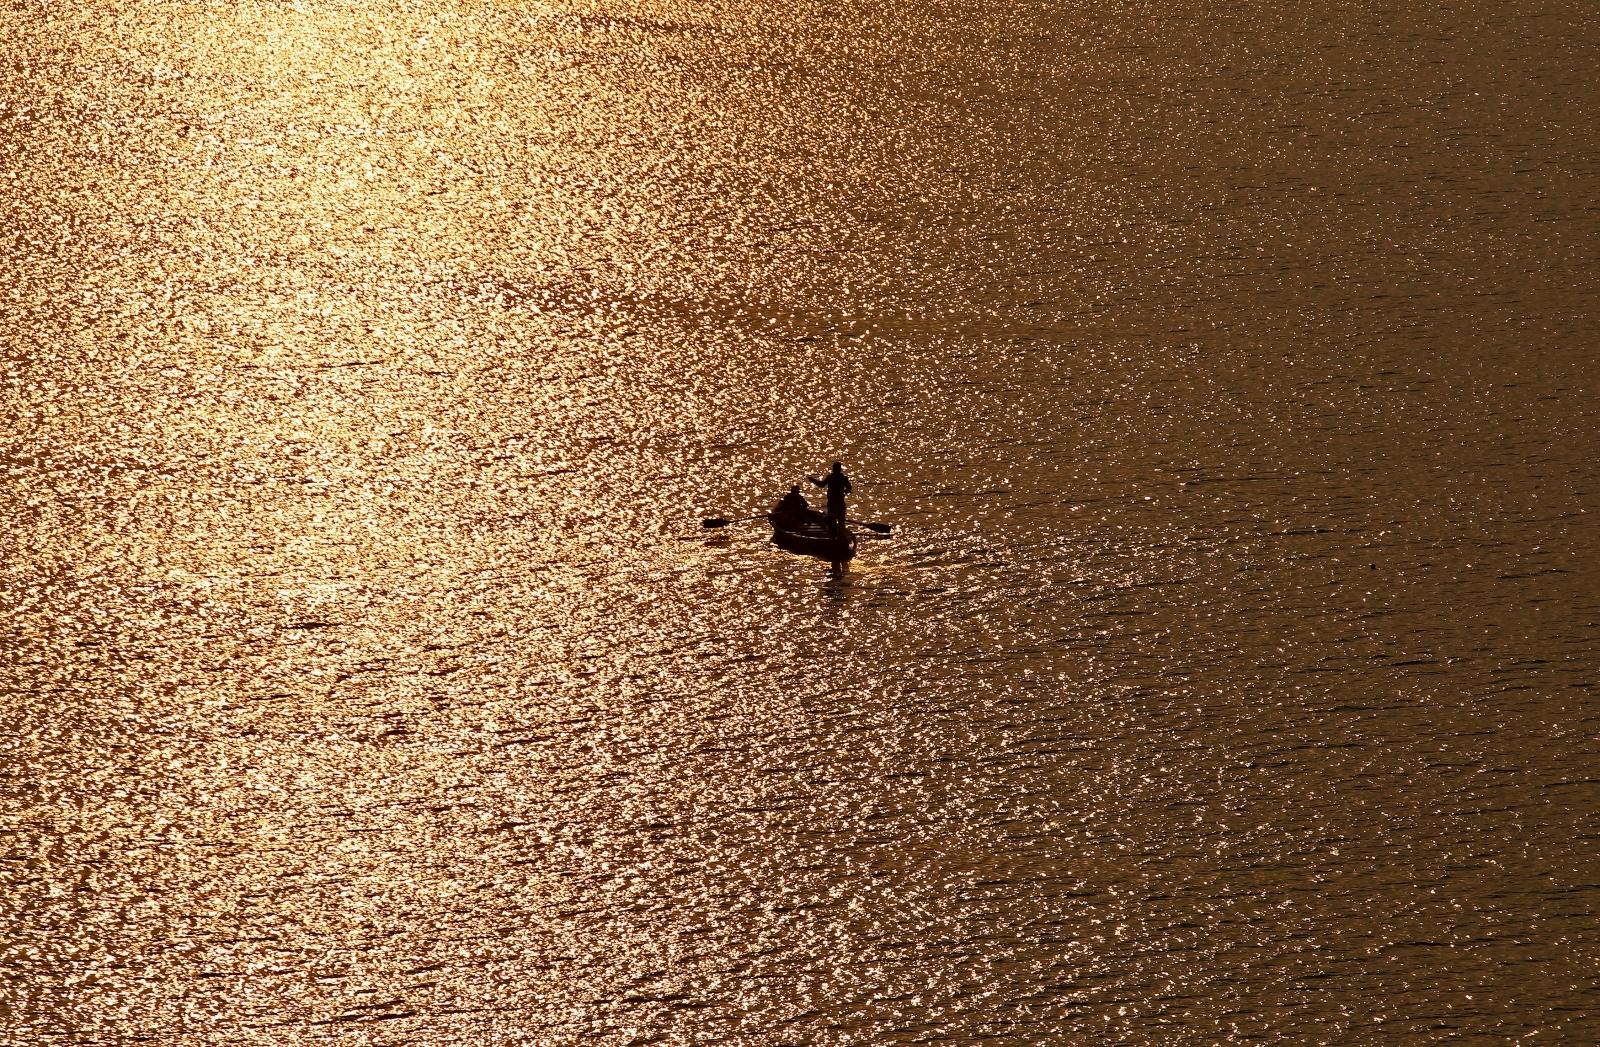 India Yamuna river boat capsized